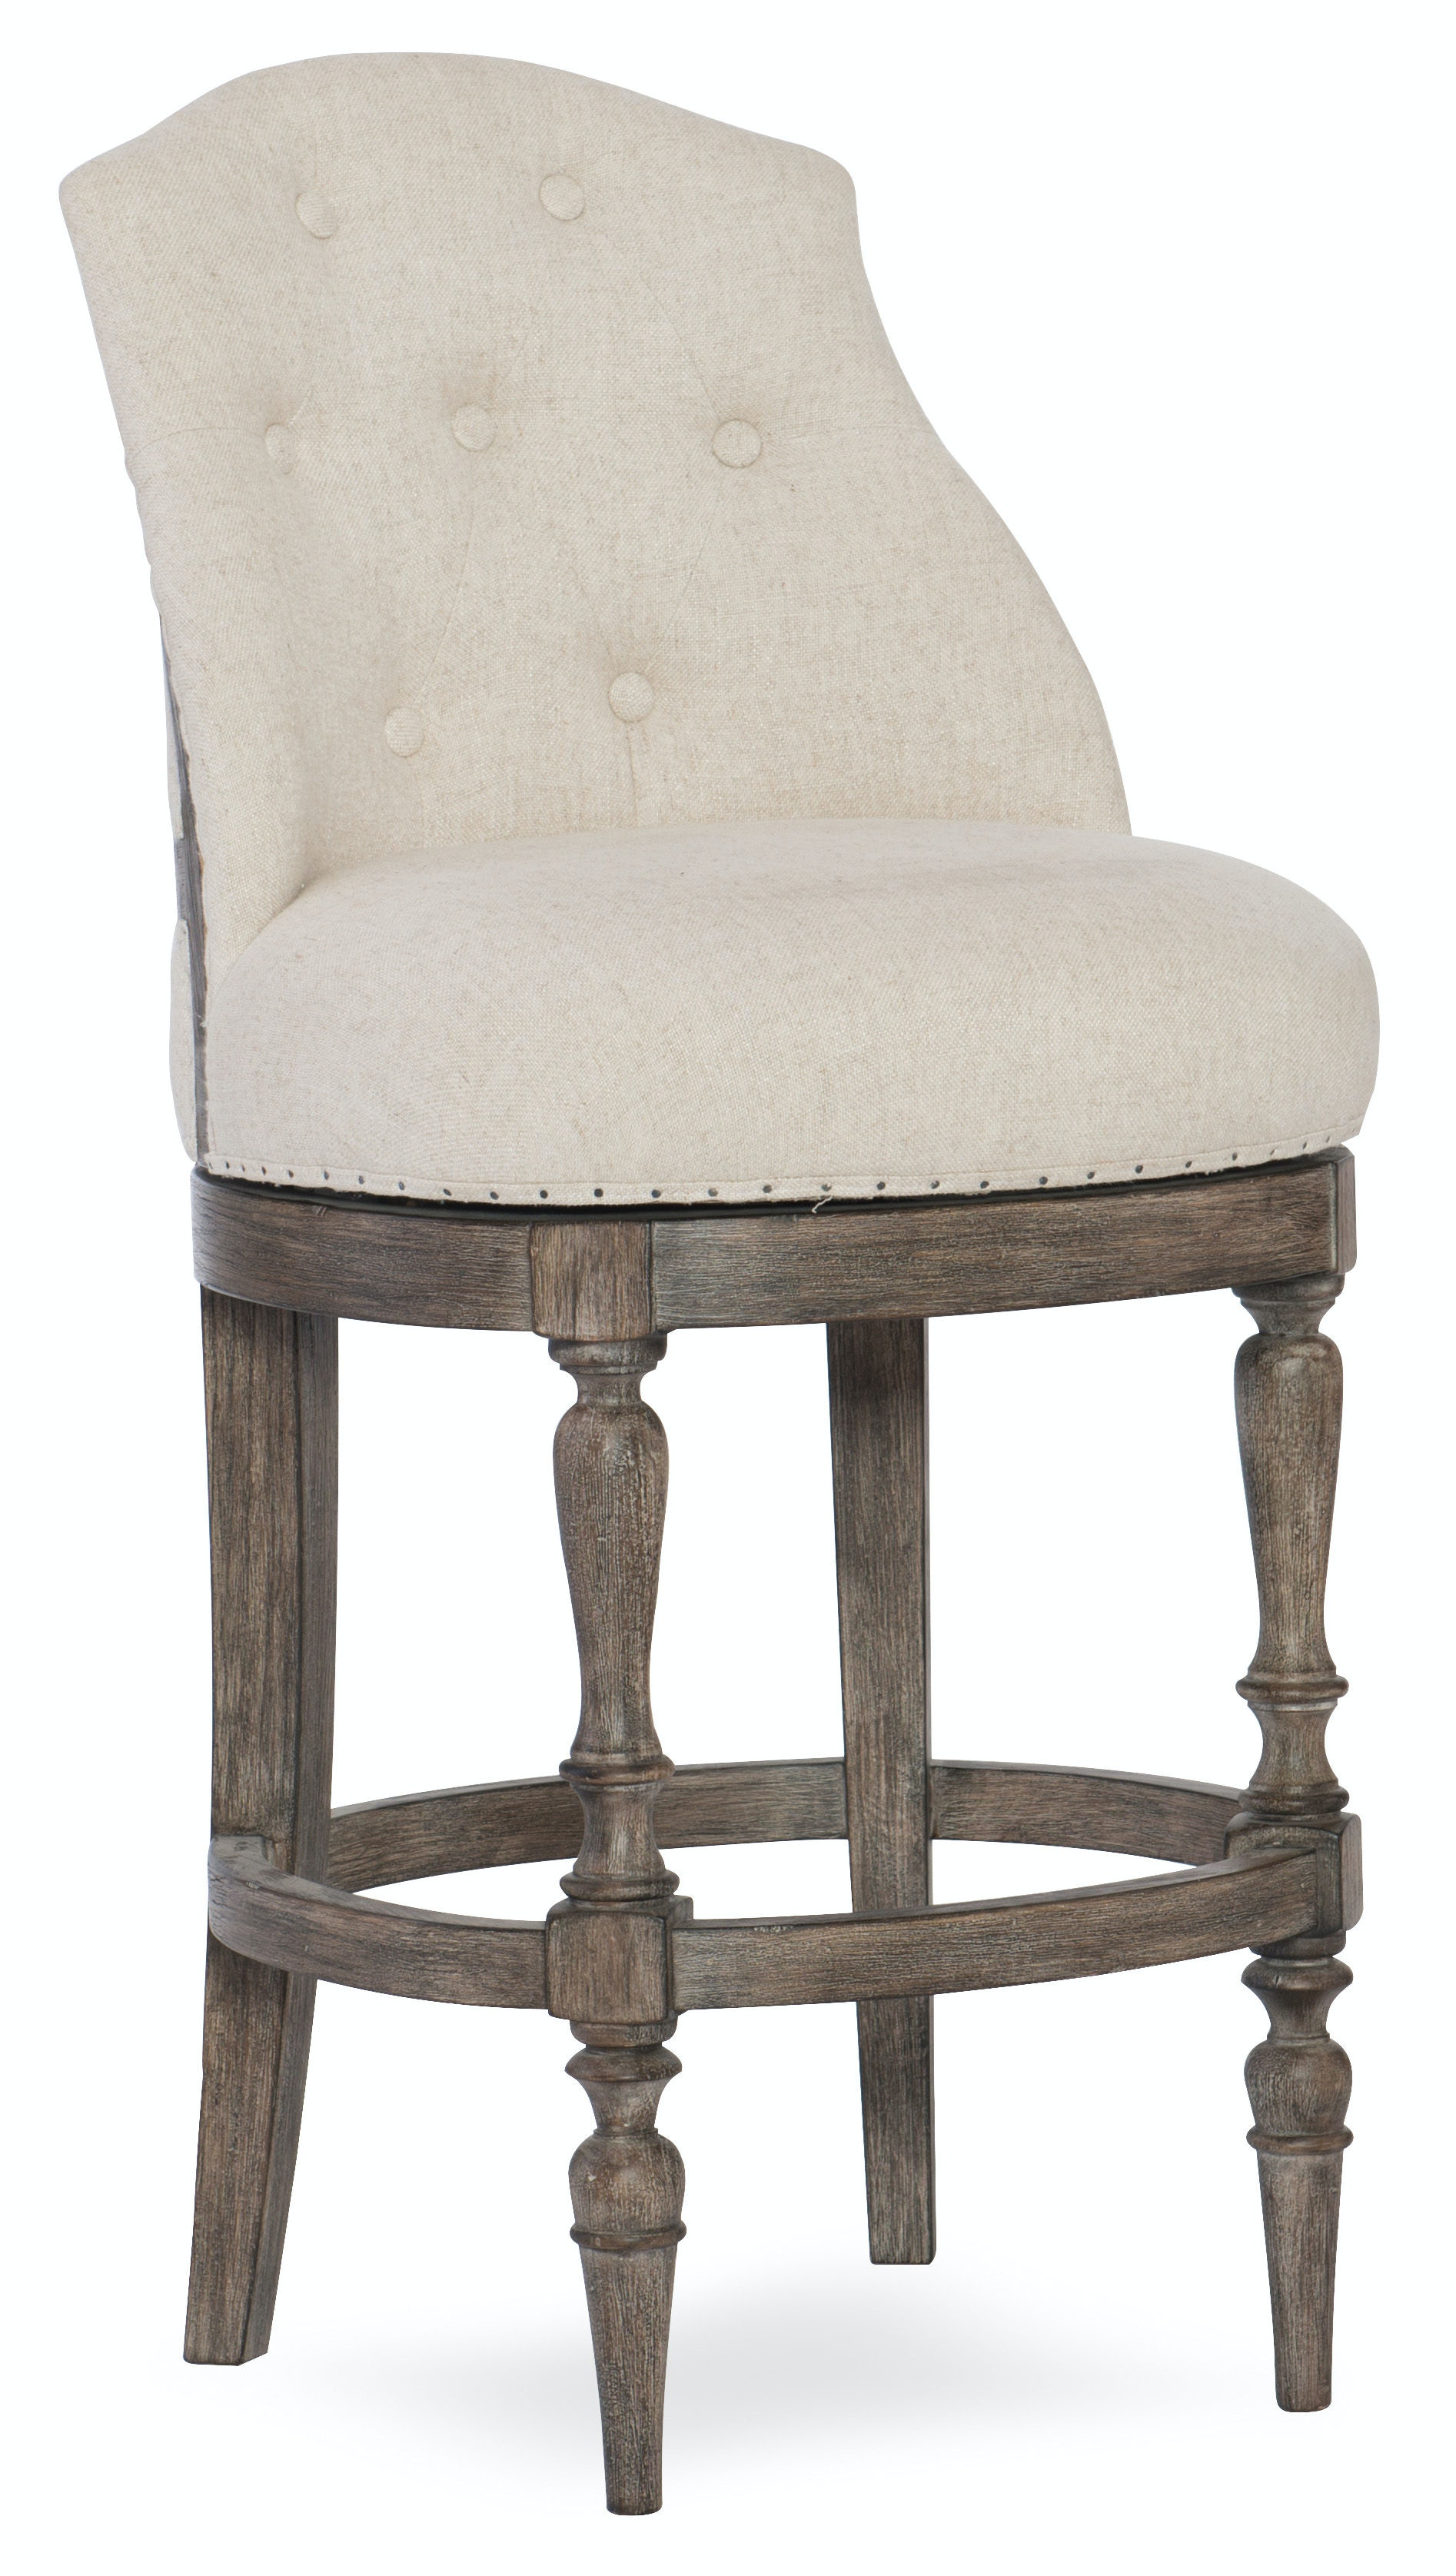 Hooker Furniture Kacey Deconstructed Counter Stool 300 25044